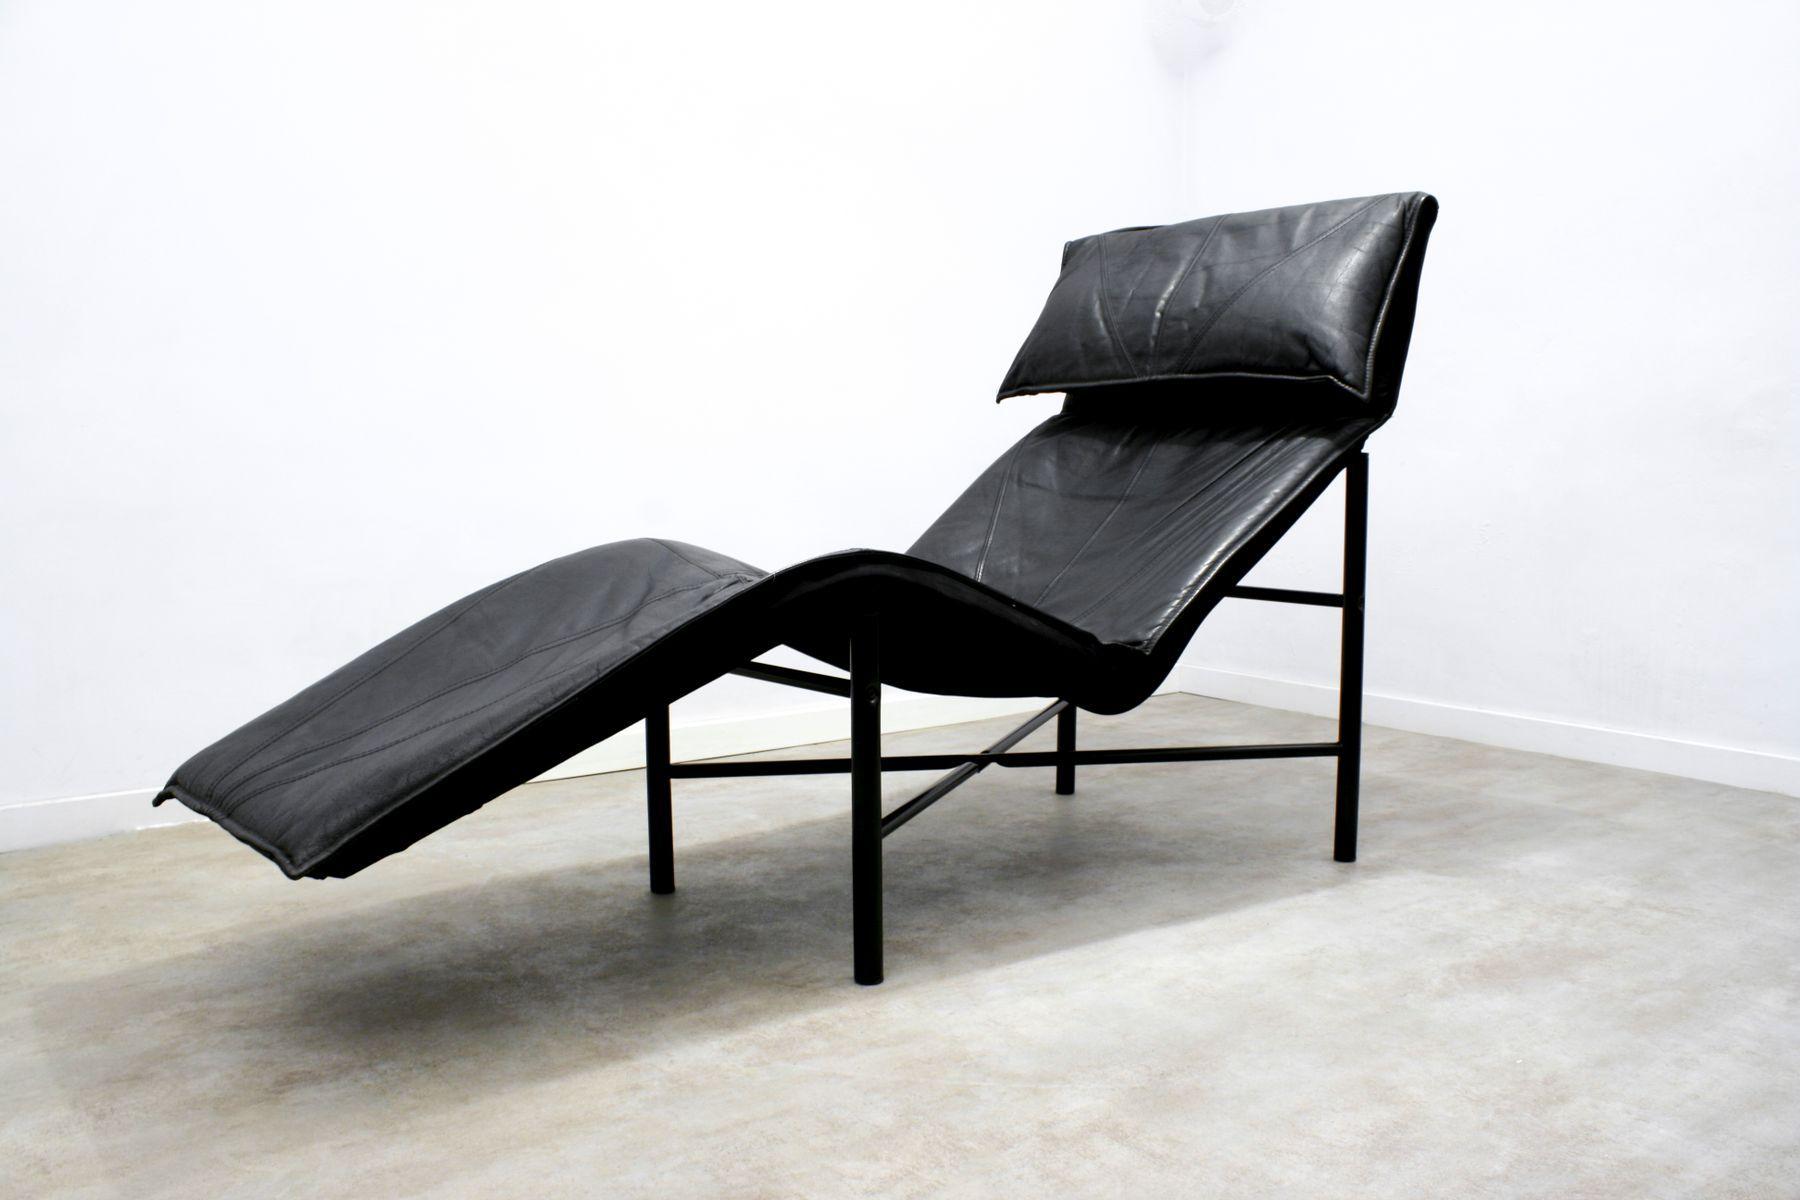 Chaise Longue Ikea Google Search Chaise Longue Ikea Chaise Longue Exterieur Chaise Longue